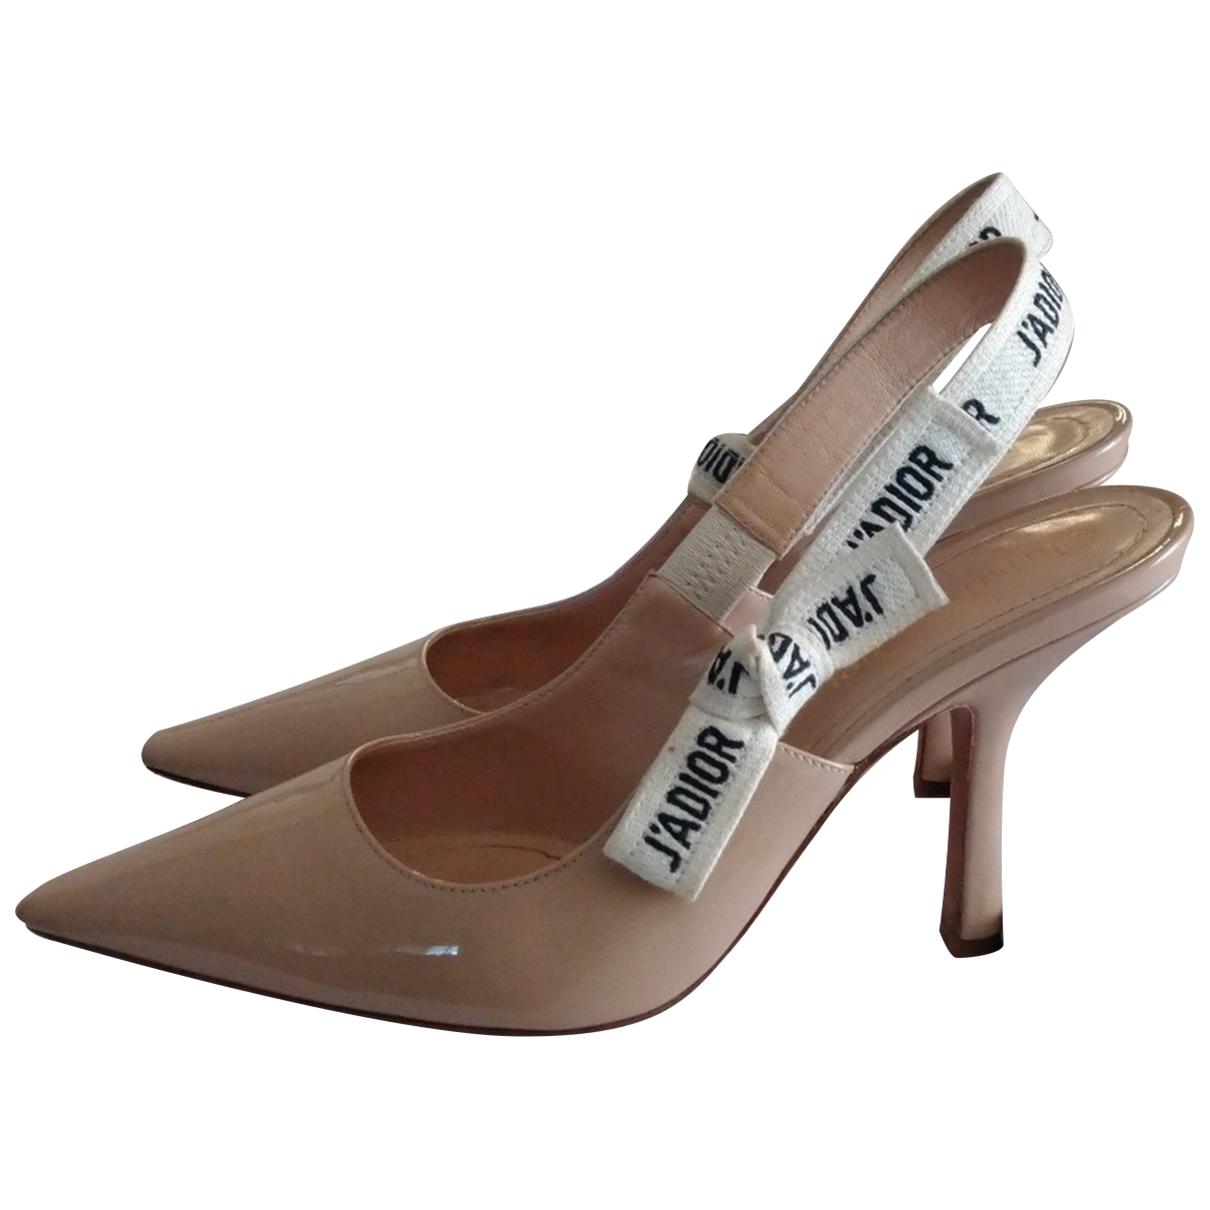 Dior - Escarpins Jadior pour femme en cuir verni - beige